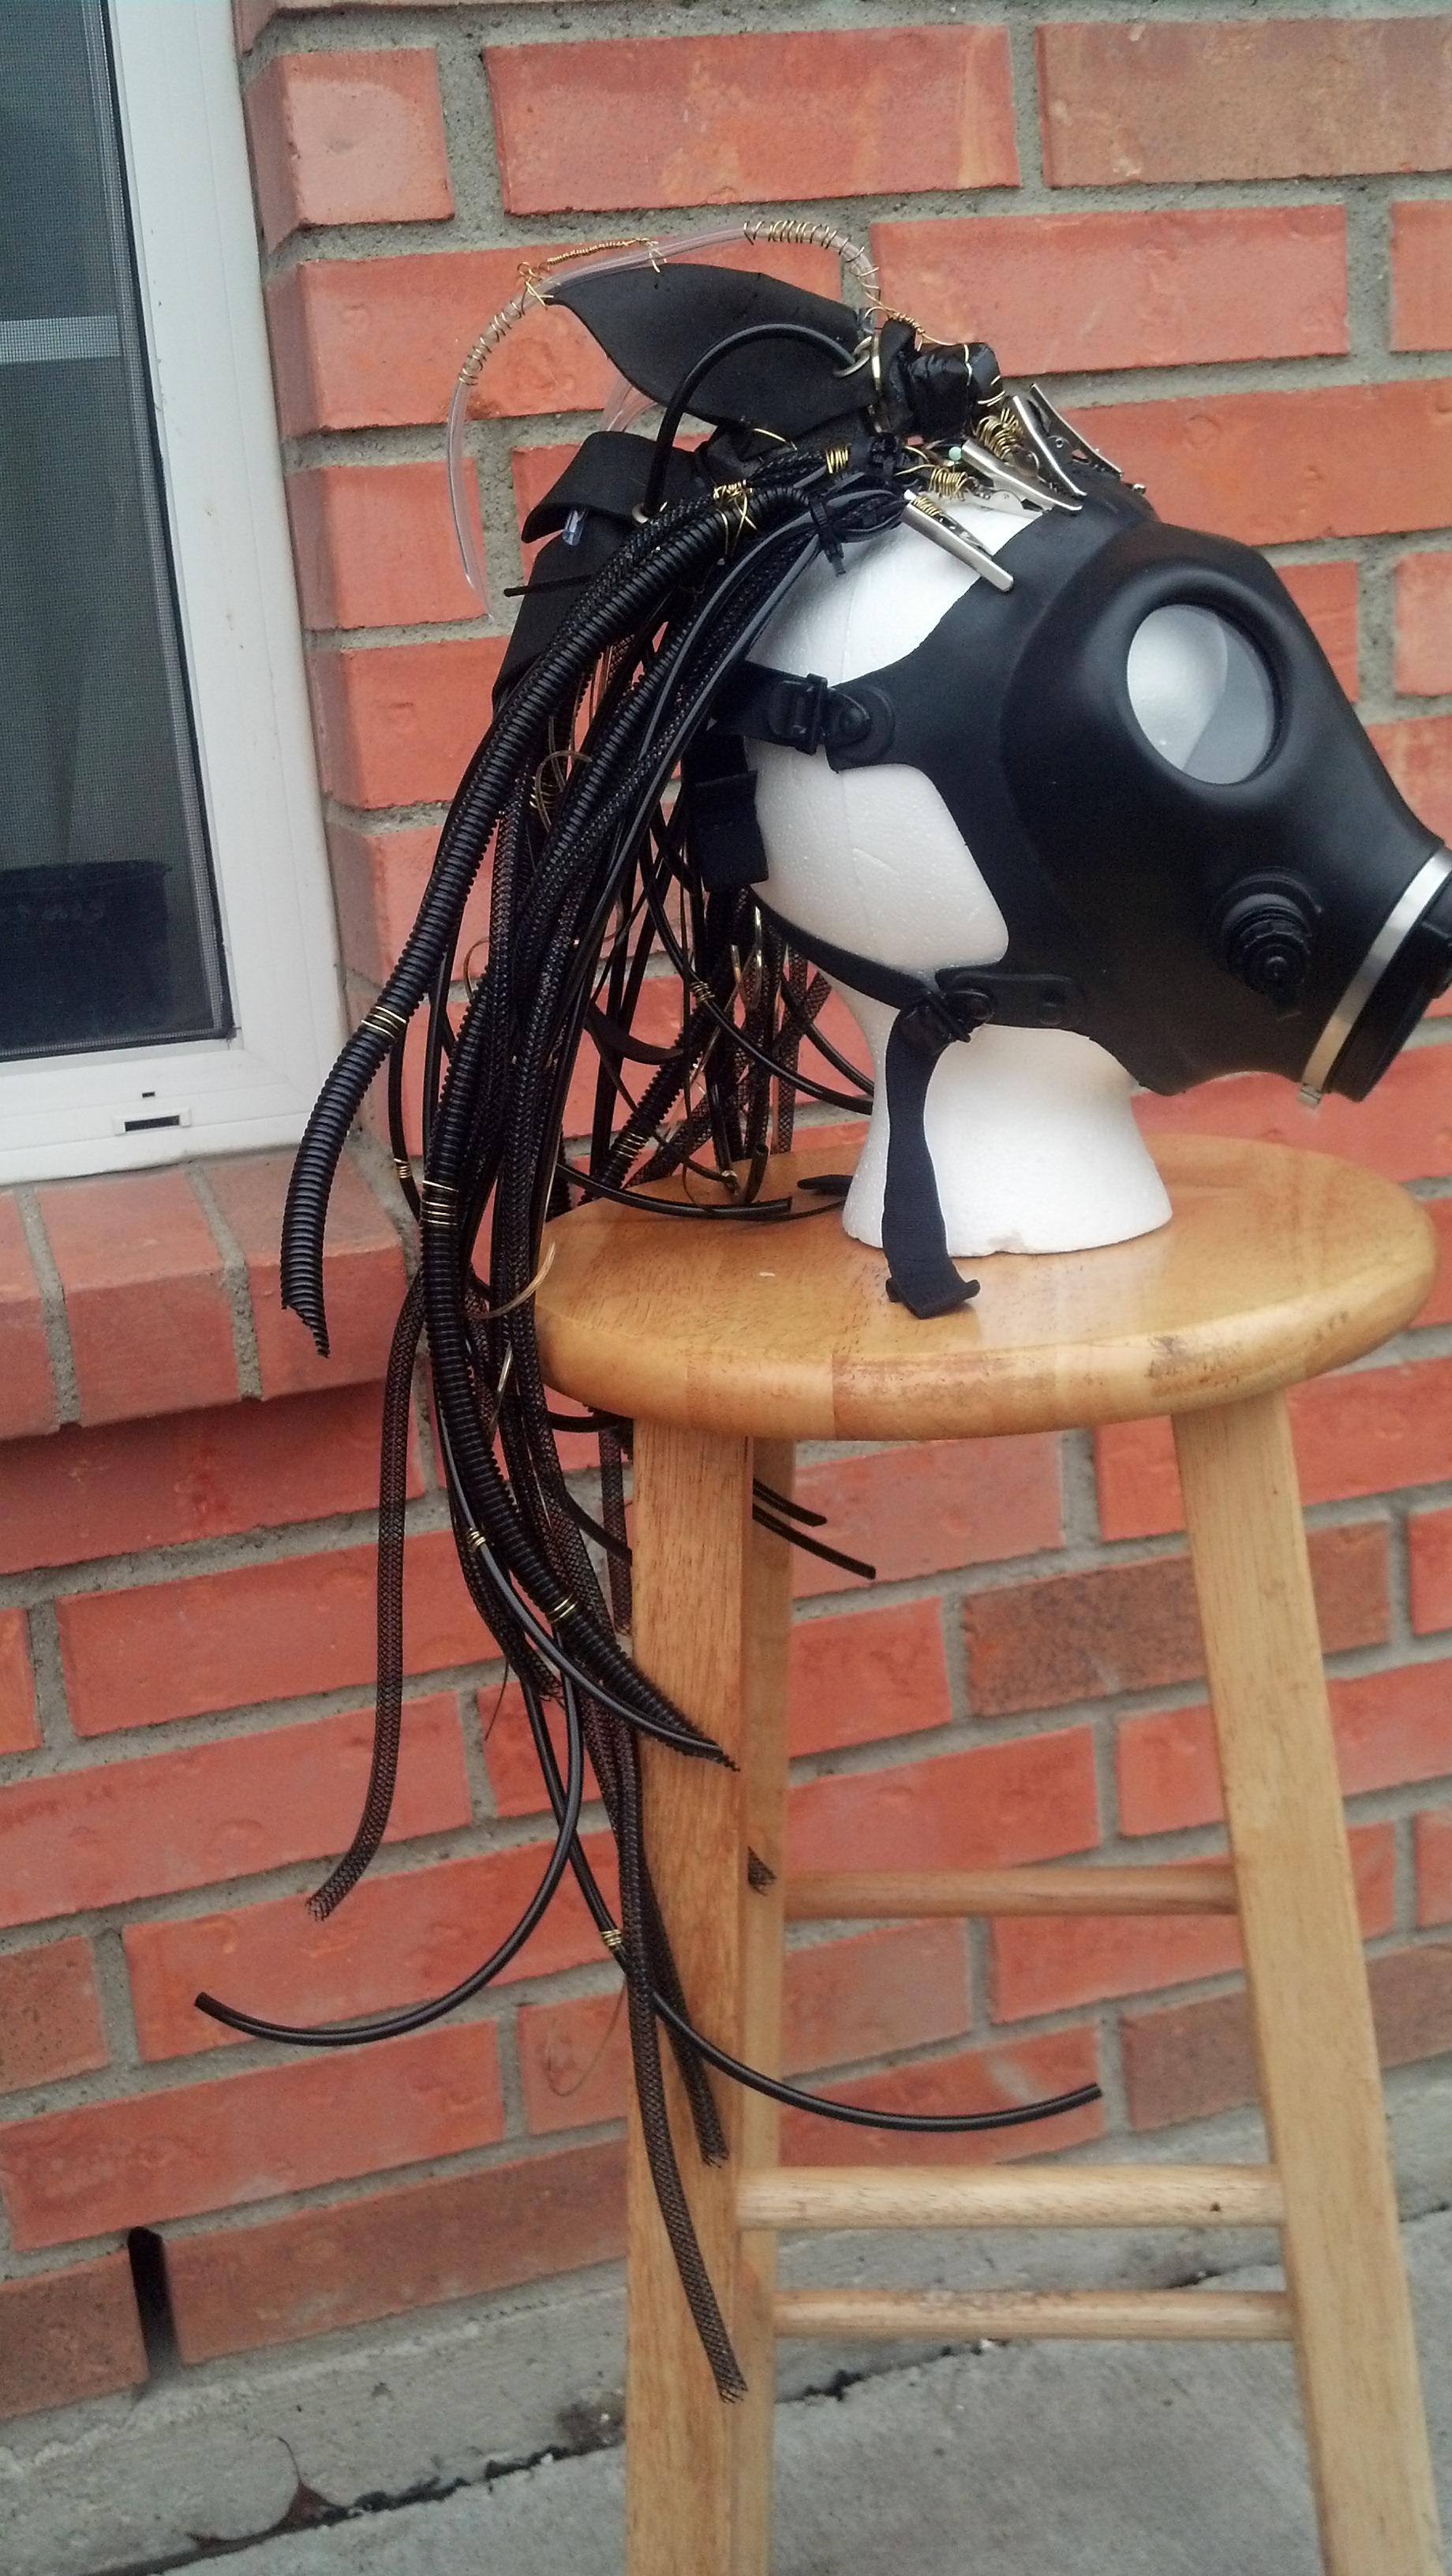 cyberpunk hair falls